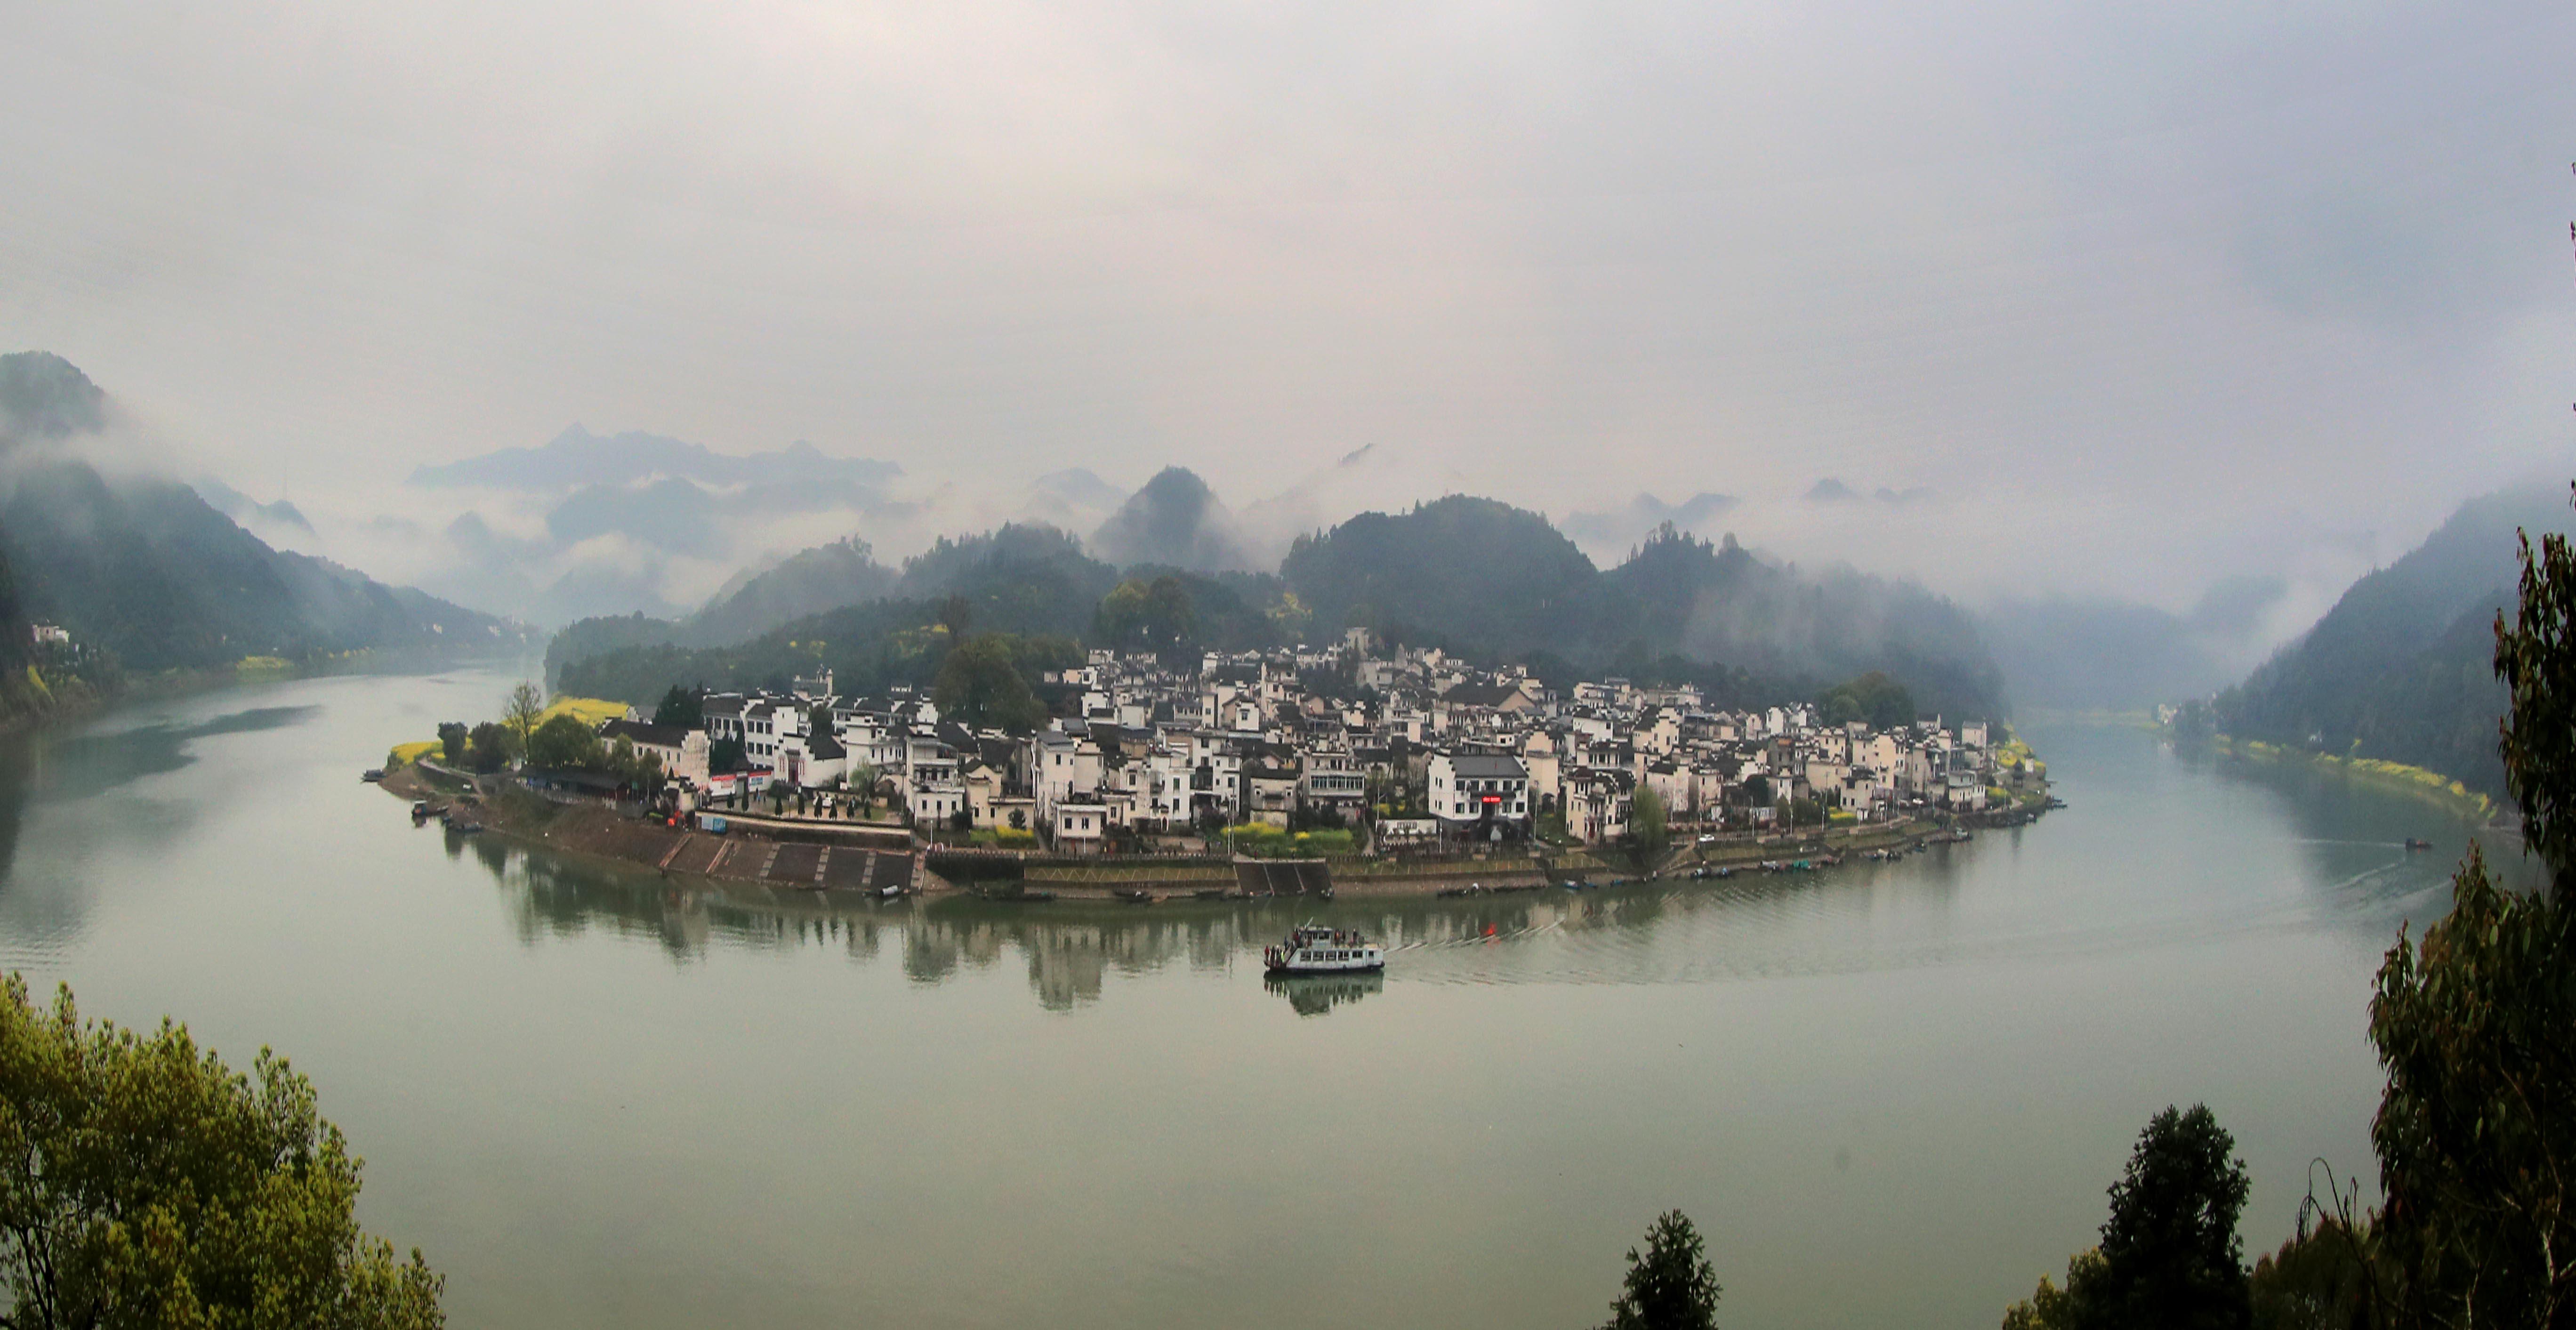 xinhua china anhui laian pond cypress scenery scenery - HD5472×2825